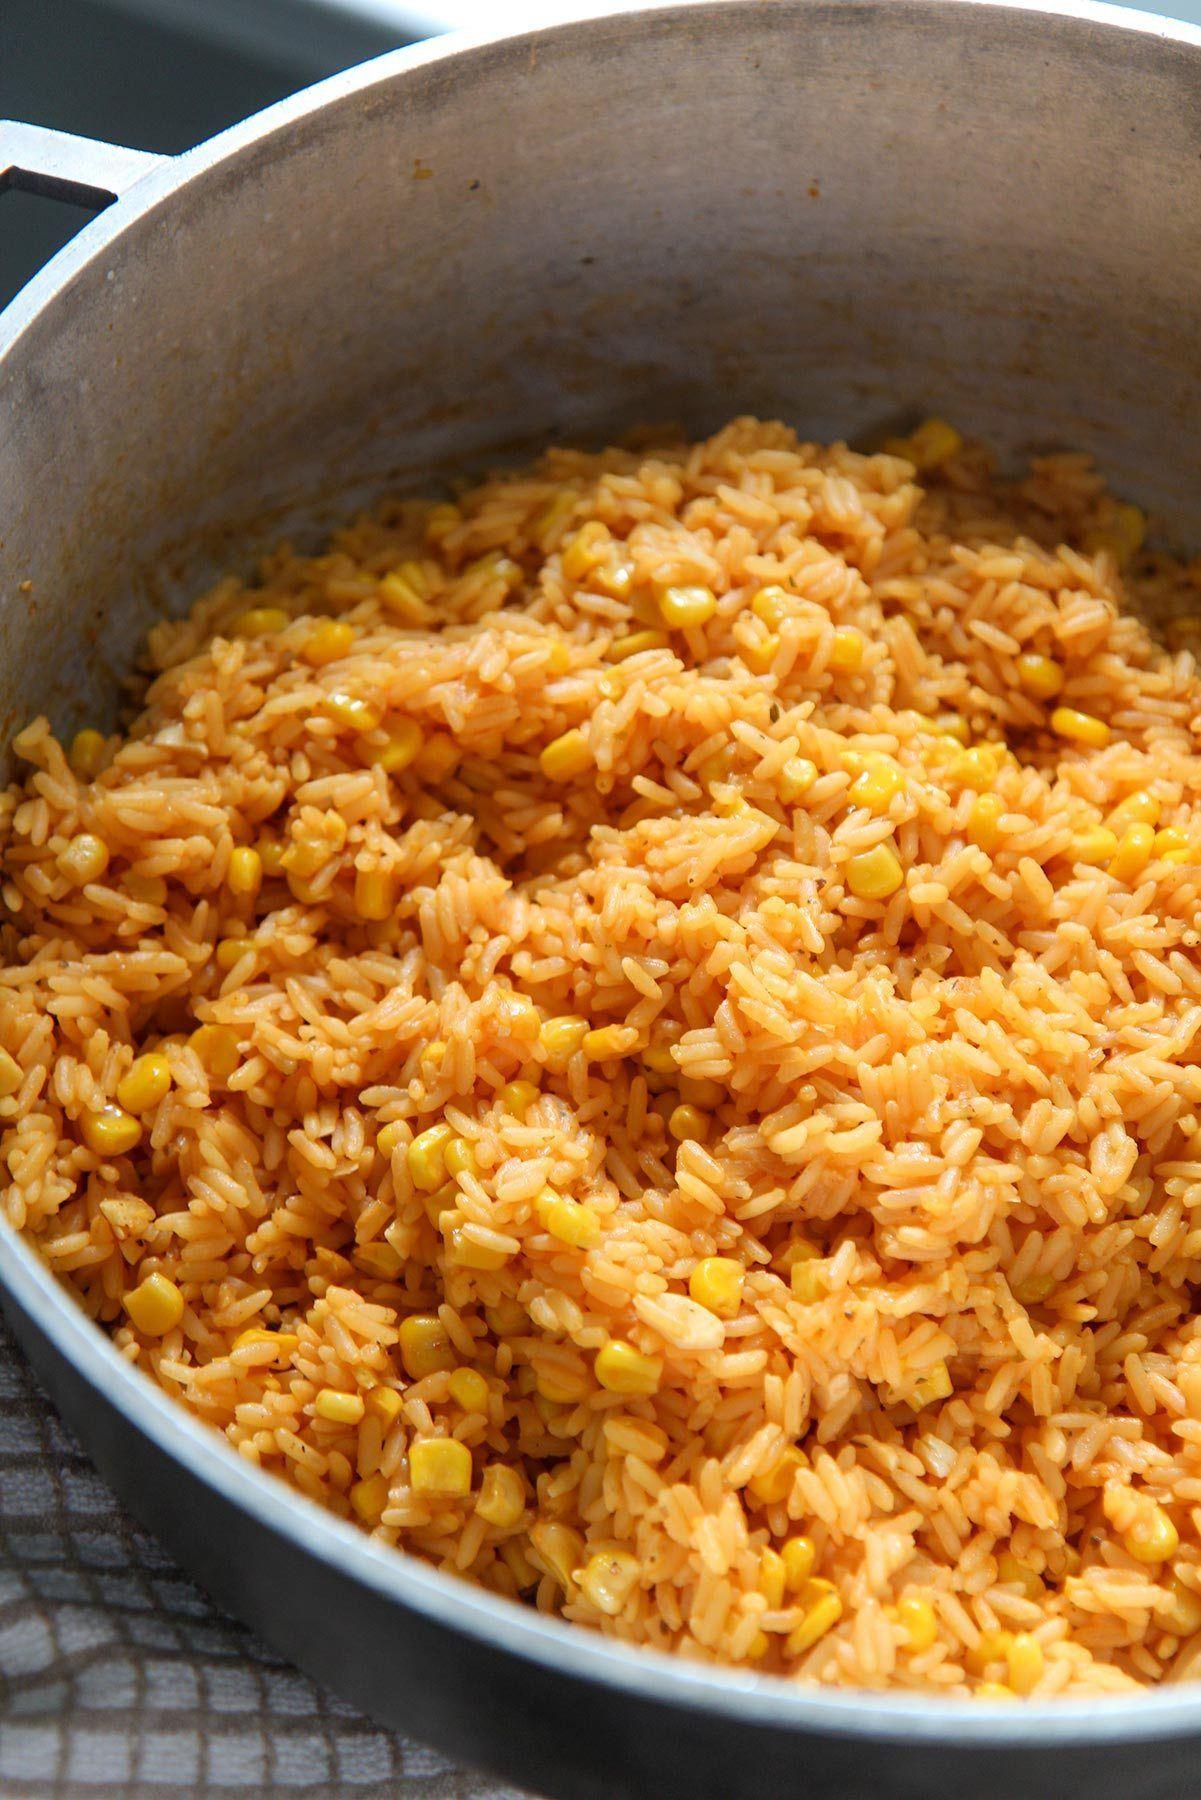 d54eb36cee9883ac8ea611ba6085e7fd - Better Homes And Gardens Spanish Rice Recipe